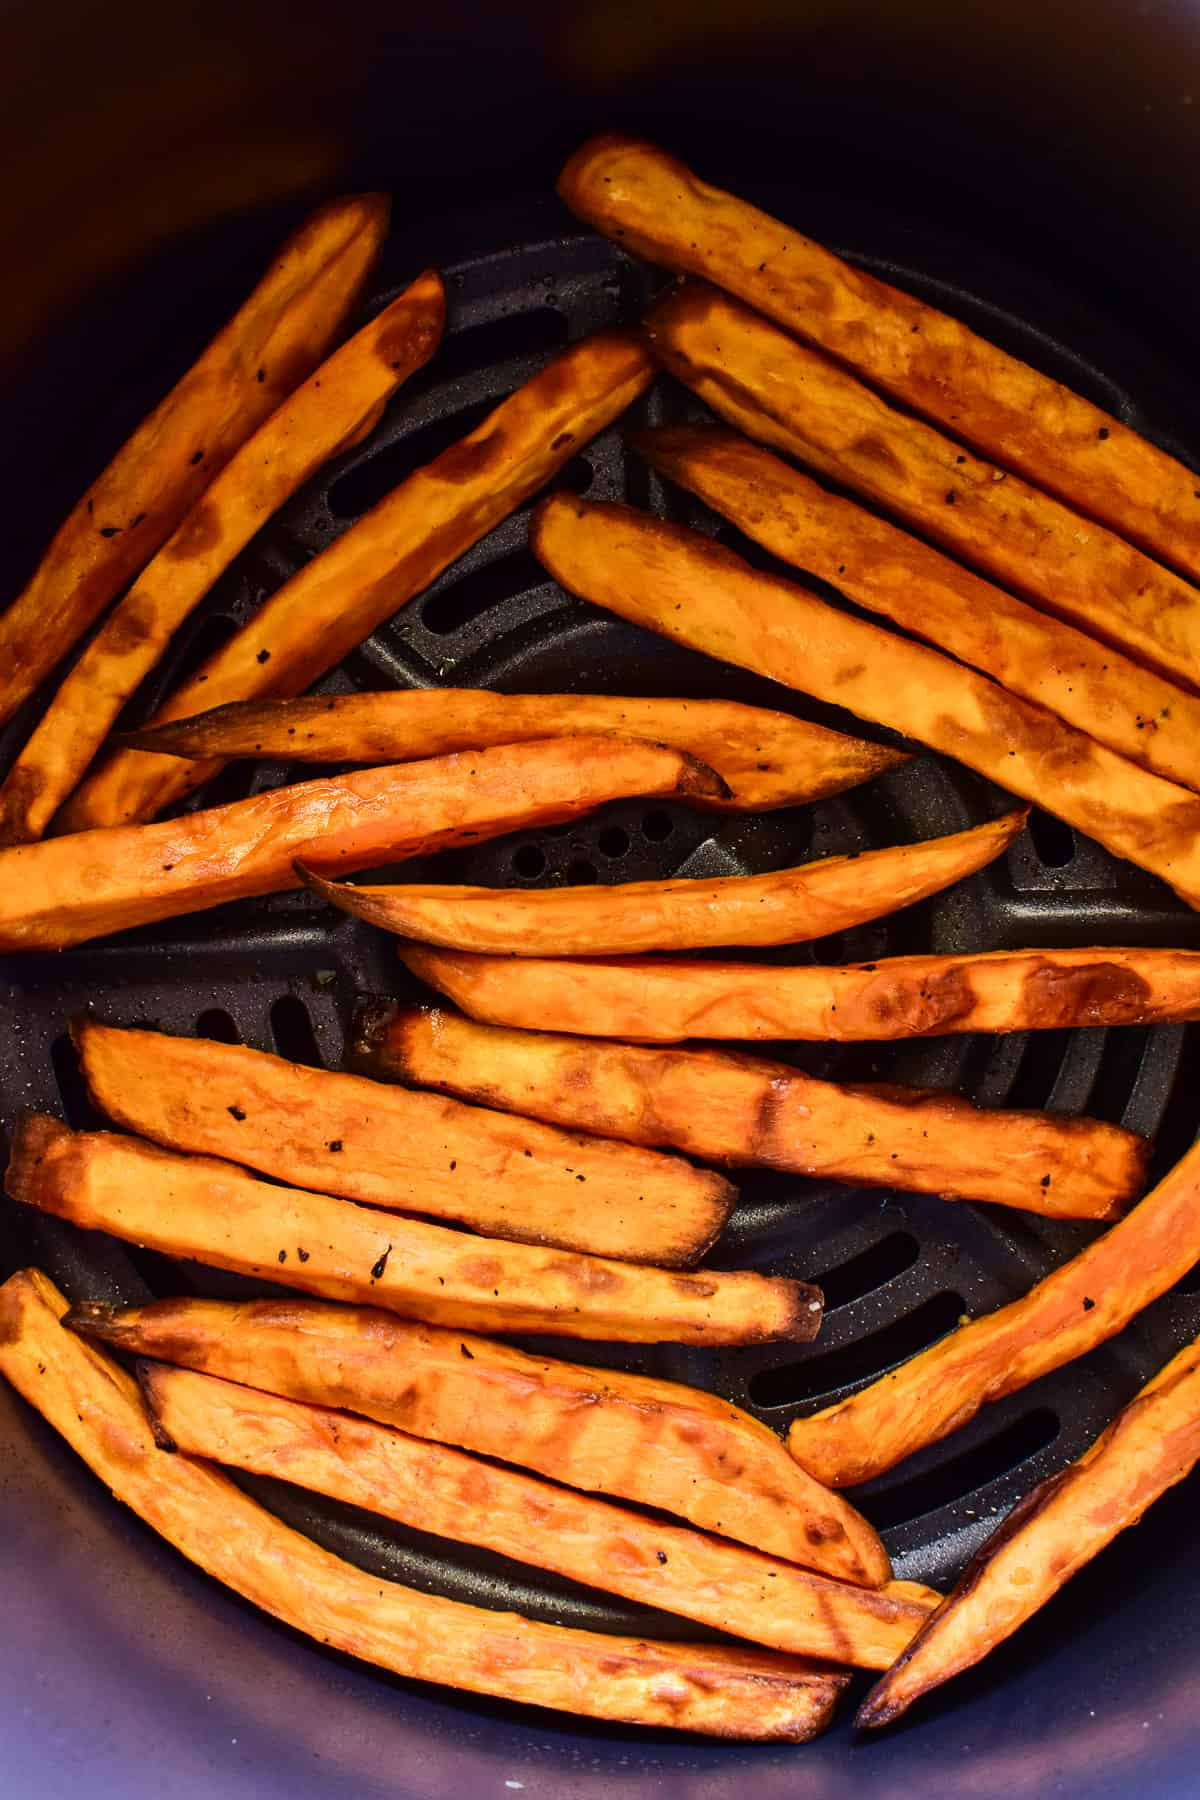 Sweet Potato Fries in an air fryer basket